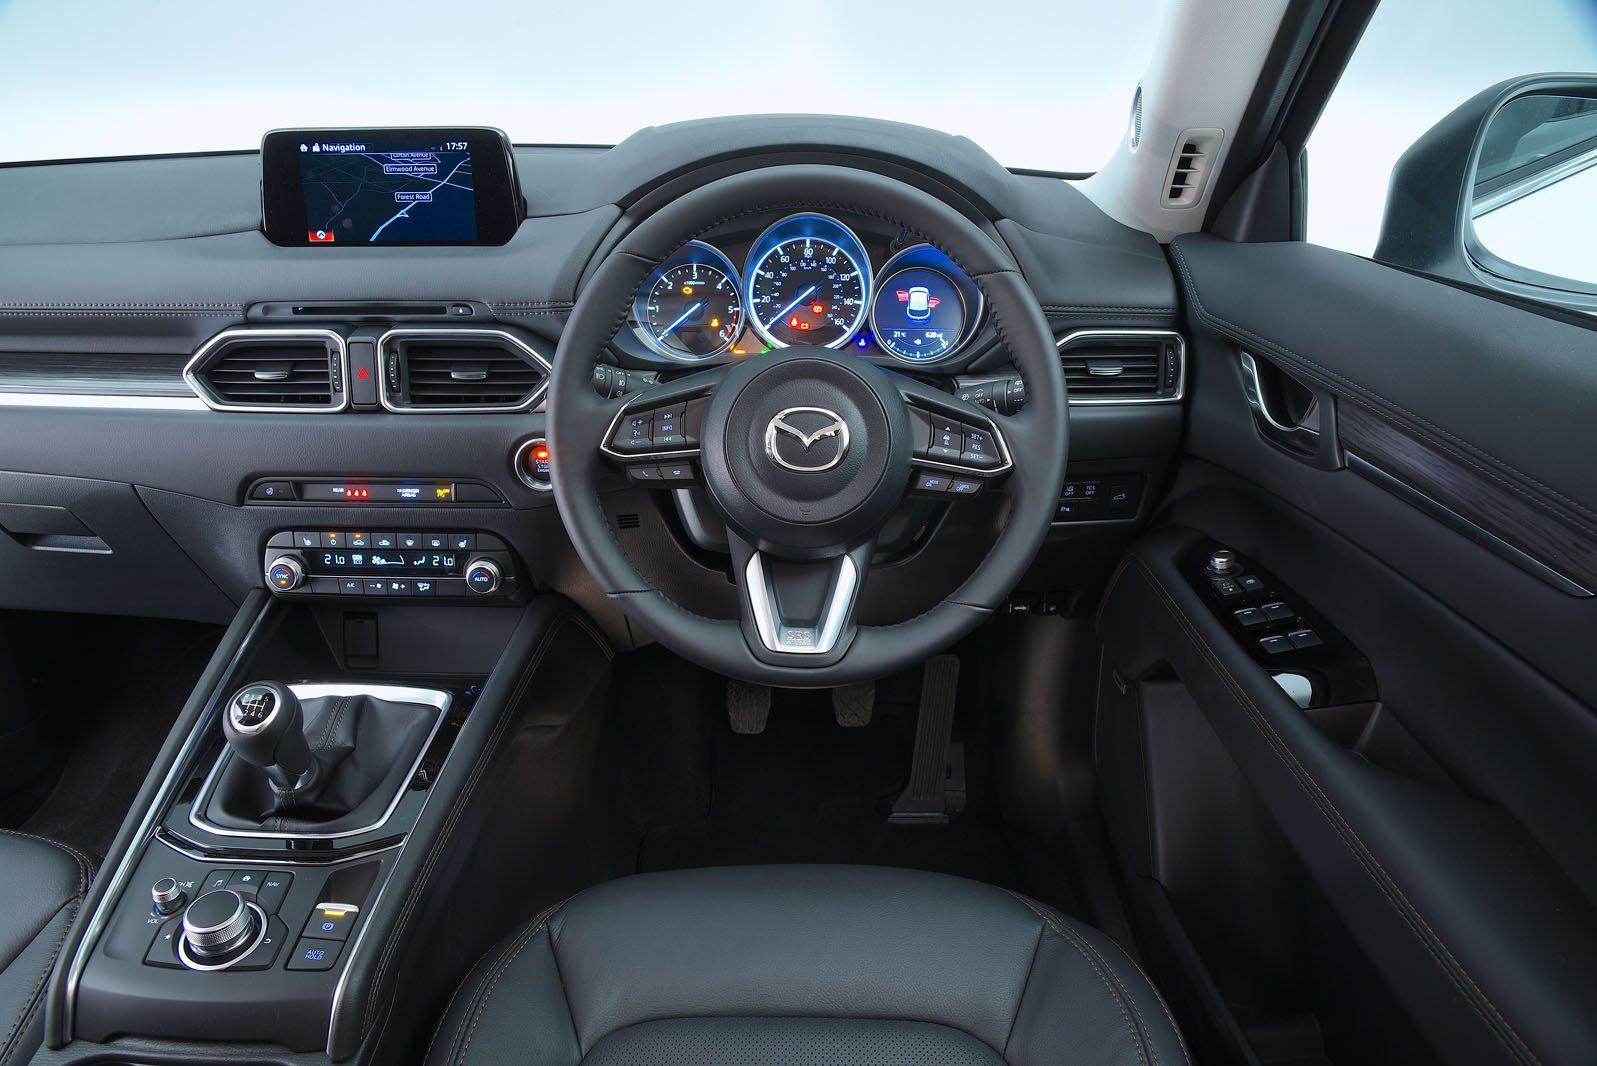 Mazda CX-5 2.2d SE-L Nav+ - interior